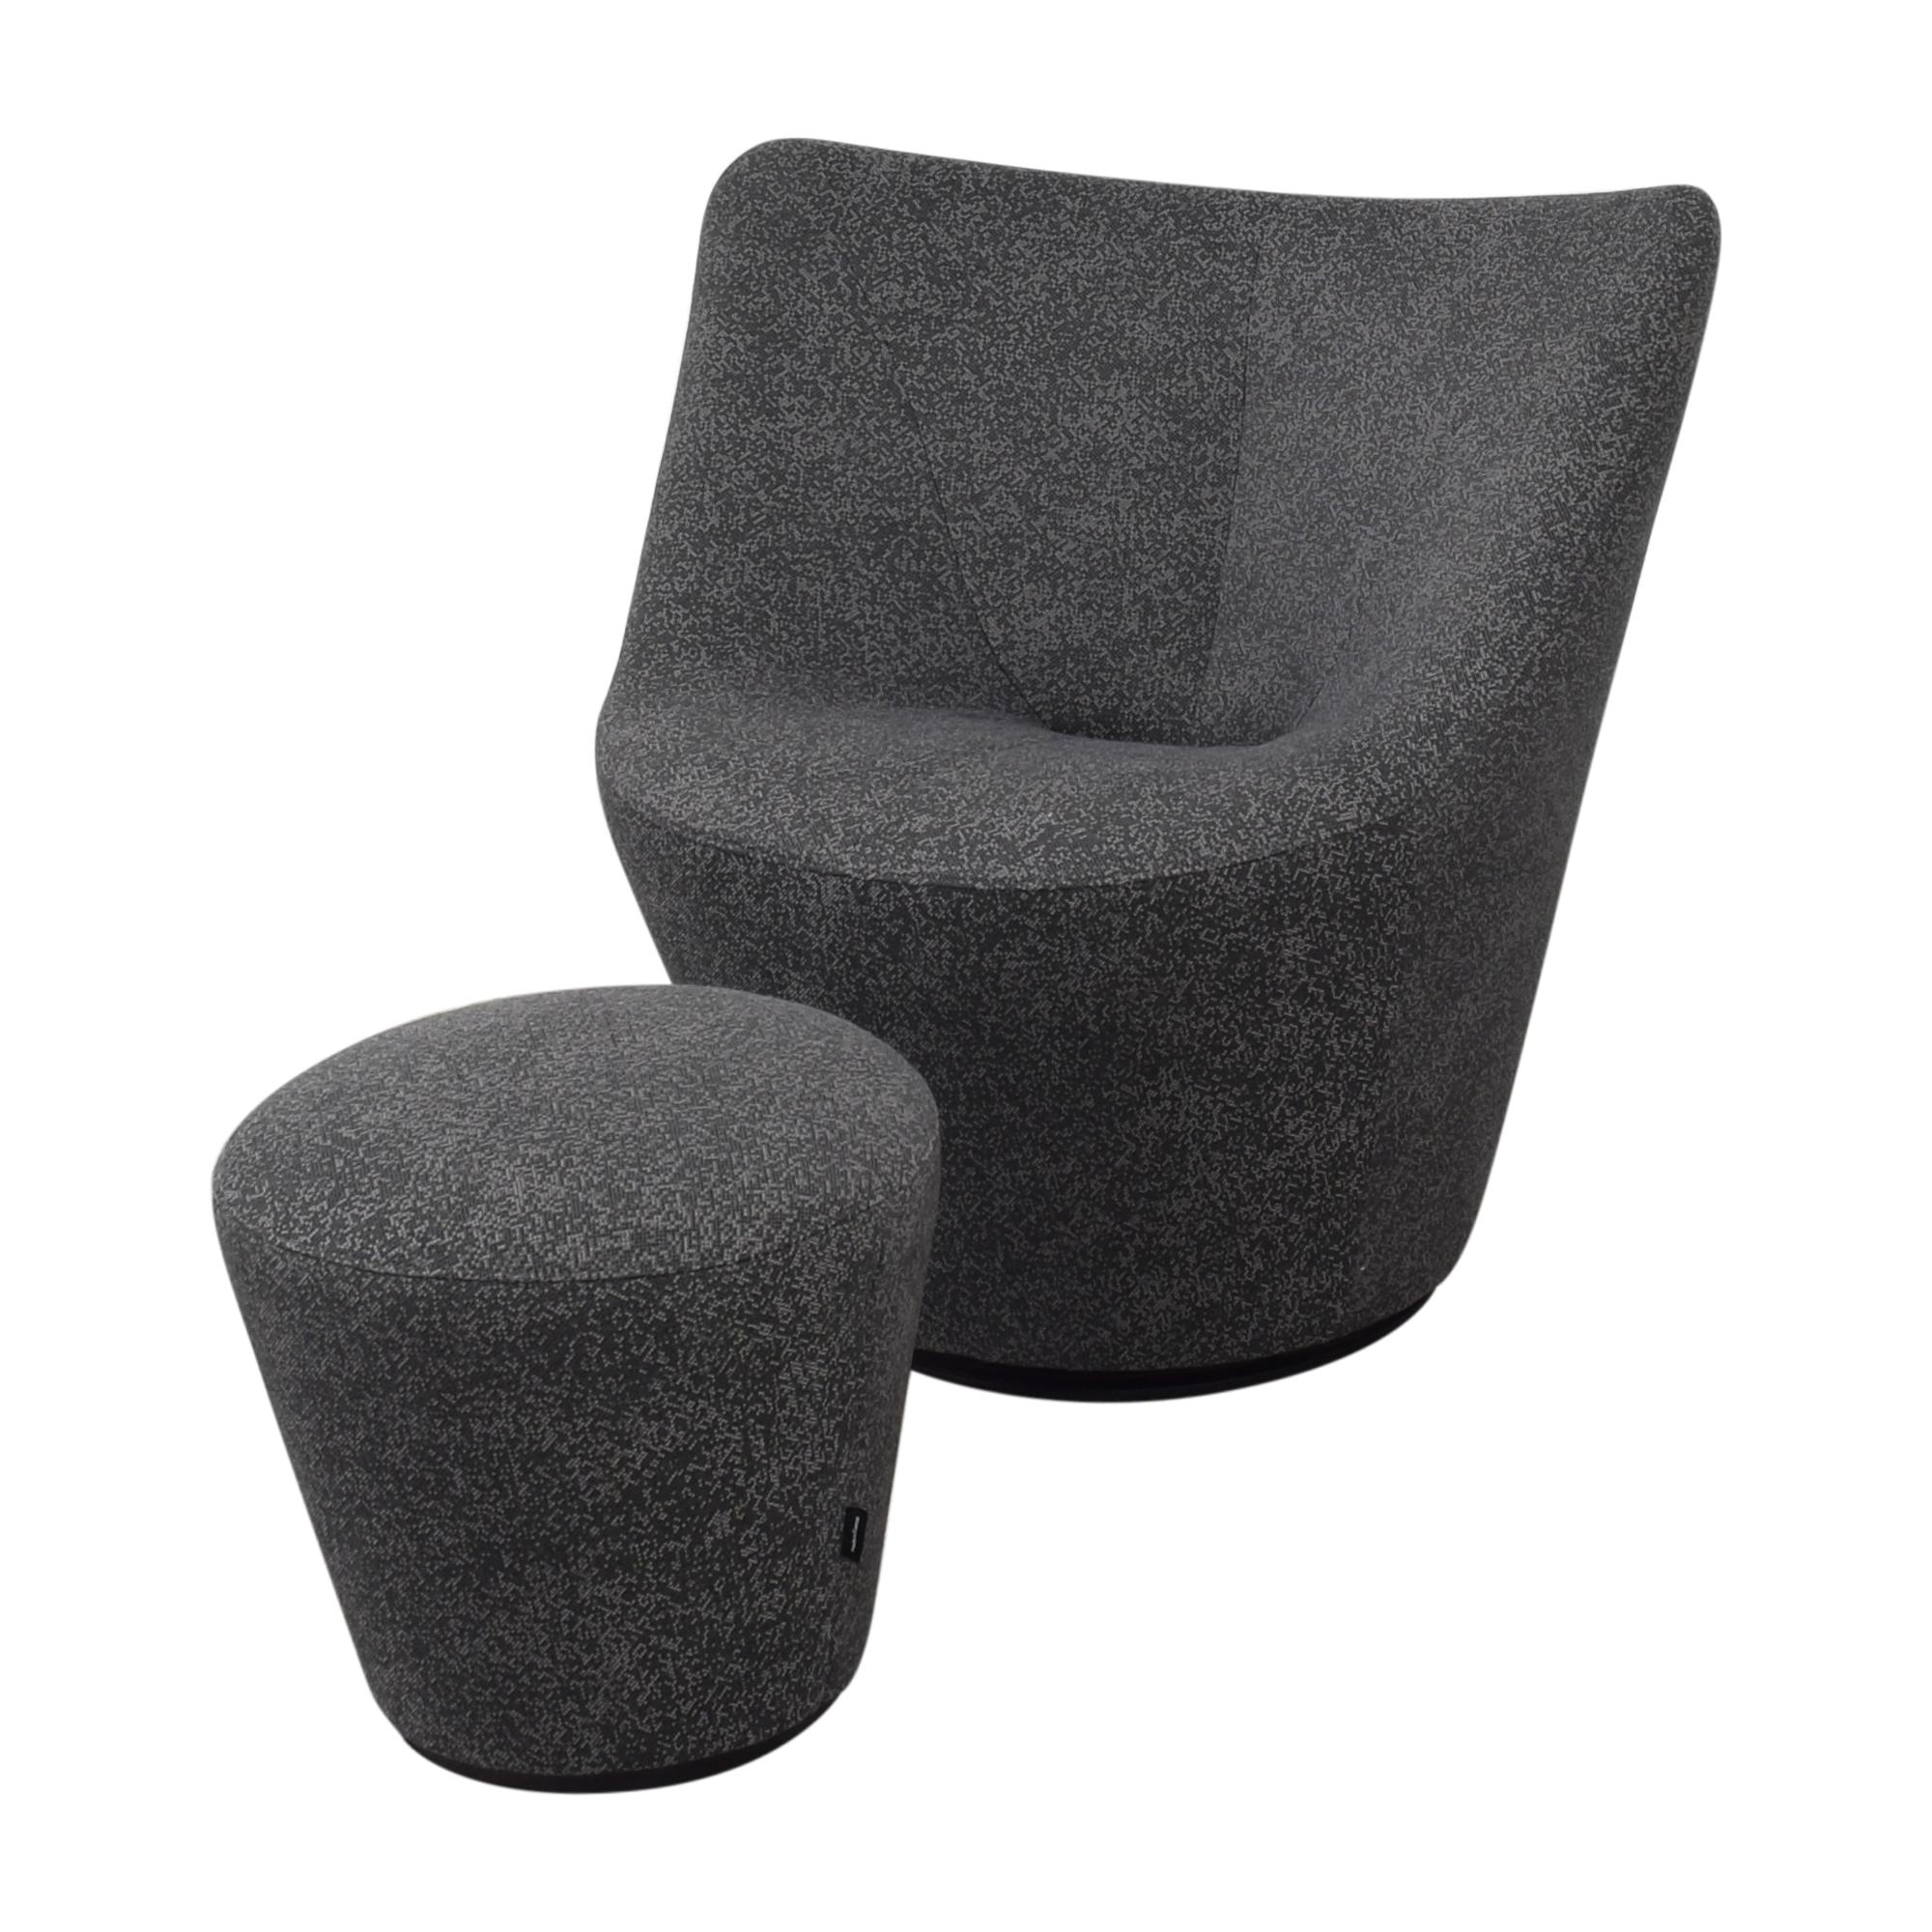 Ligne Roset Ligne Roset Anda Armchair with Ottoman Chairs